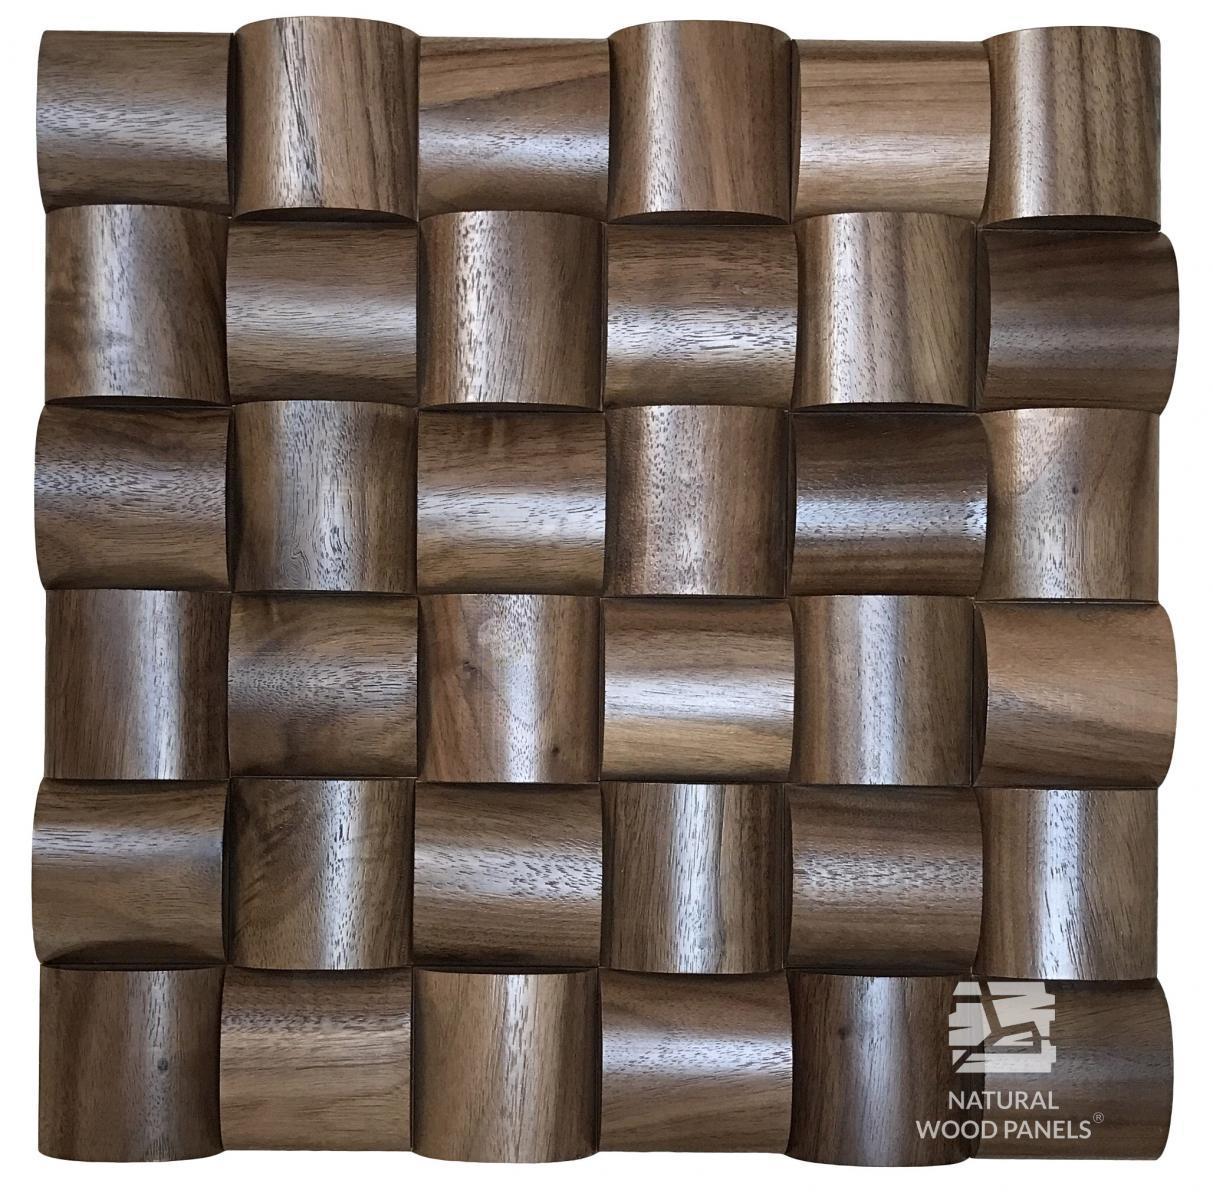 Panele Wave series – Orzech amerykański *100  Natural Wood Panels